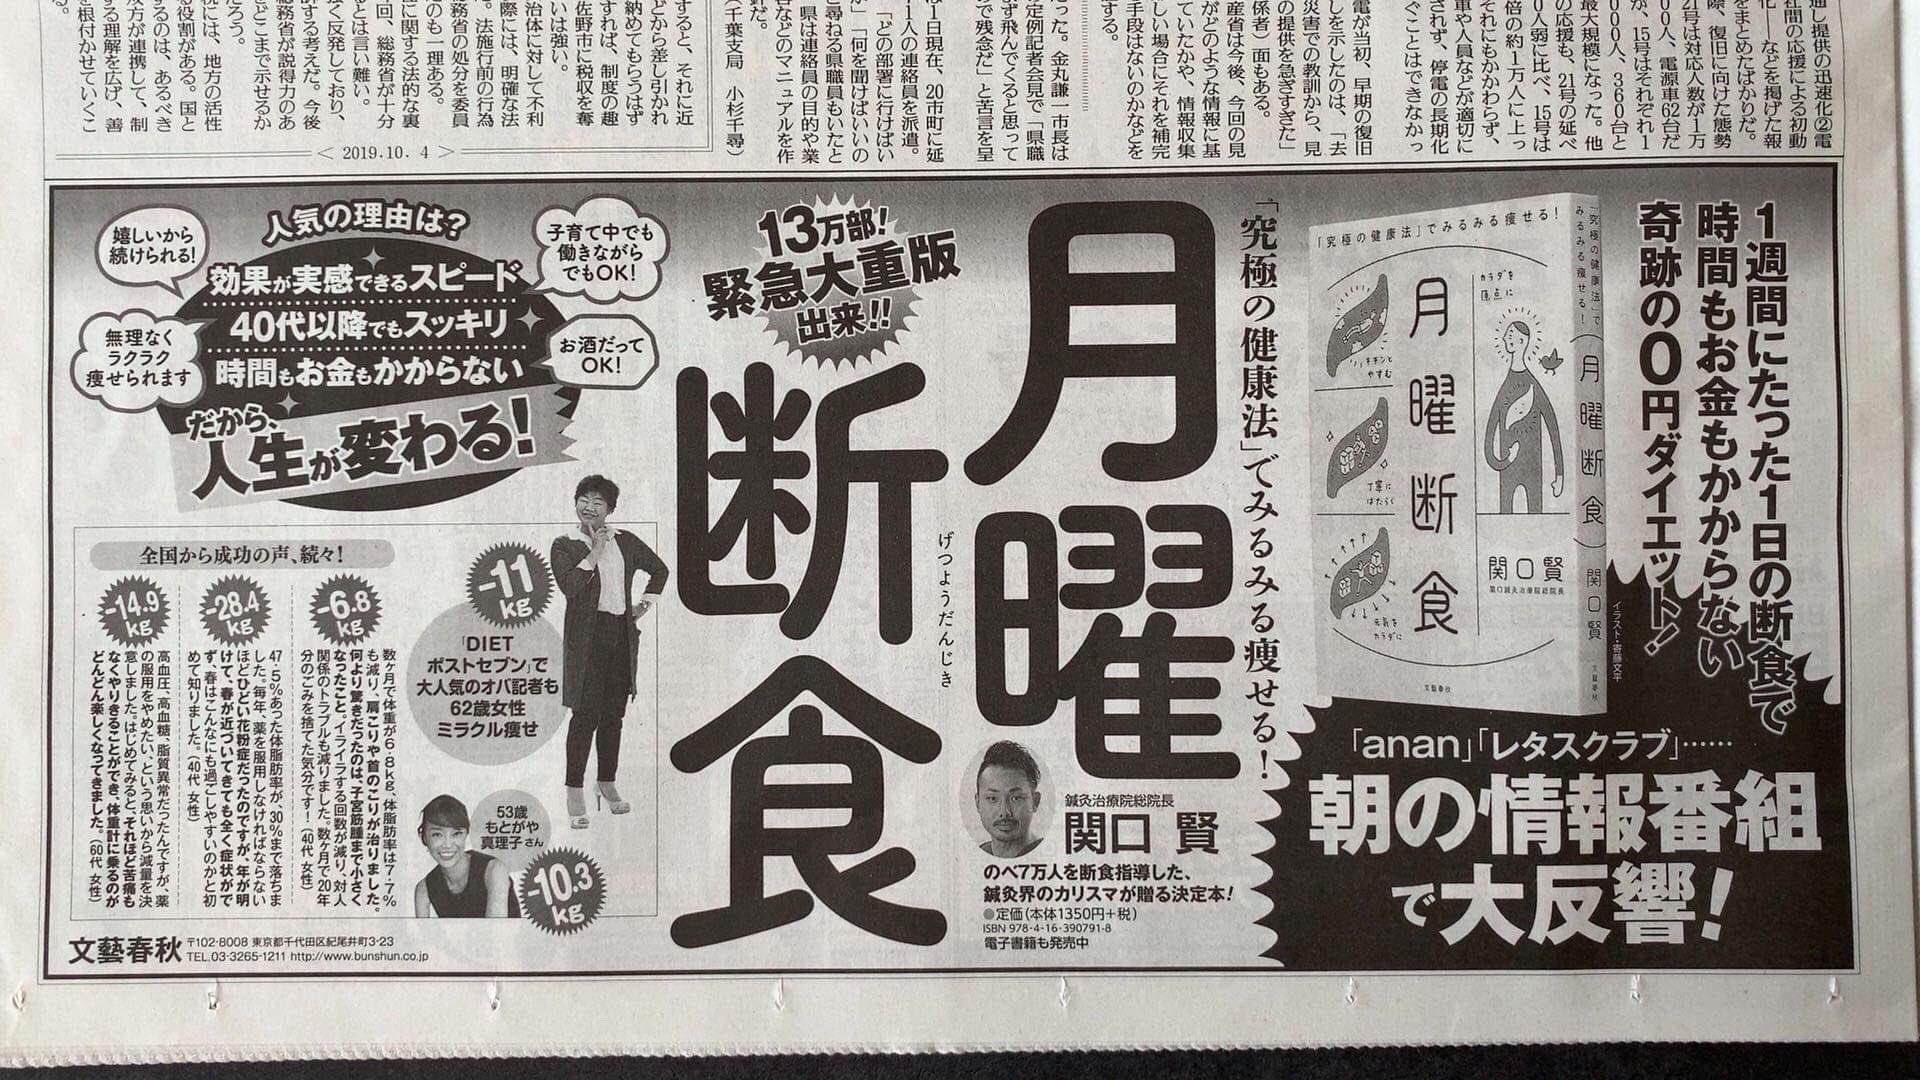 月曜断食の新聞広告